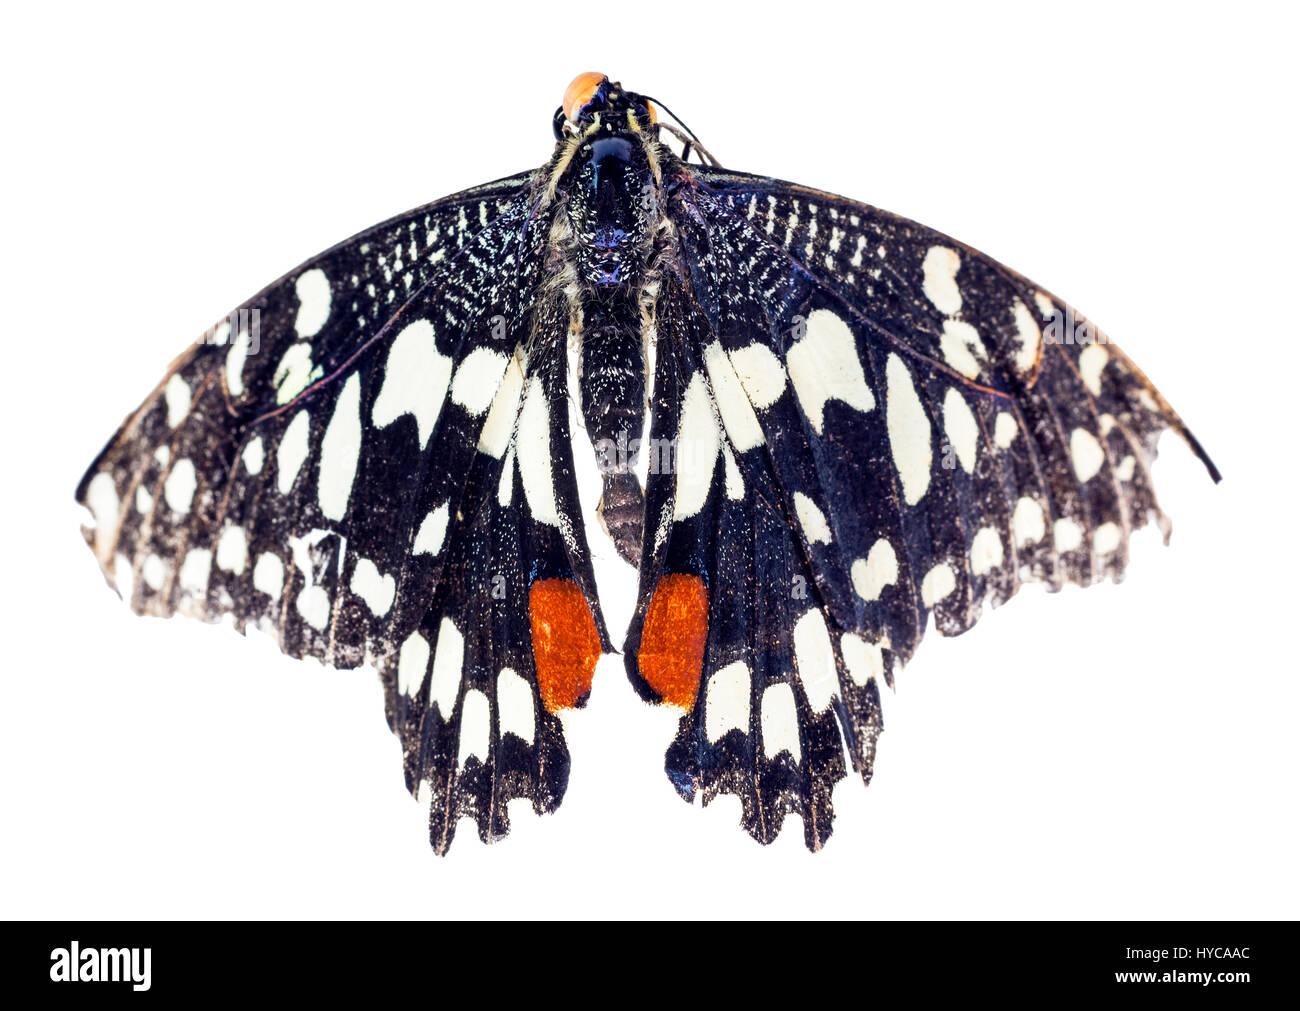 Calce comune butterfly (Papilio demoleus) Immagini Stock